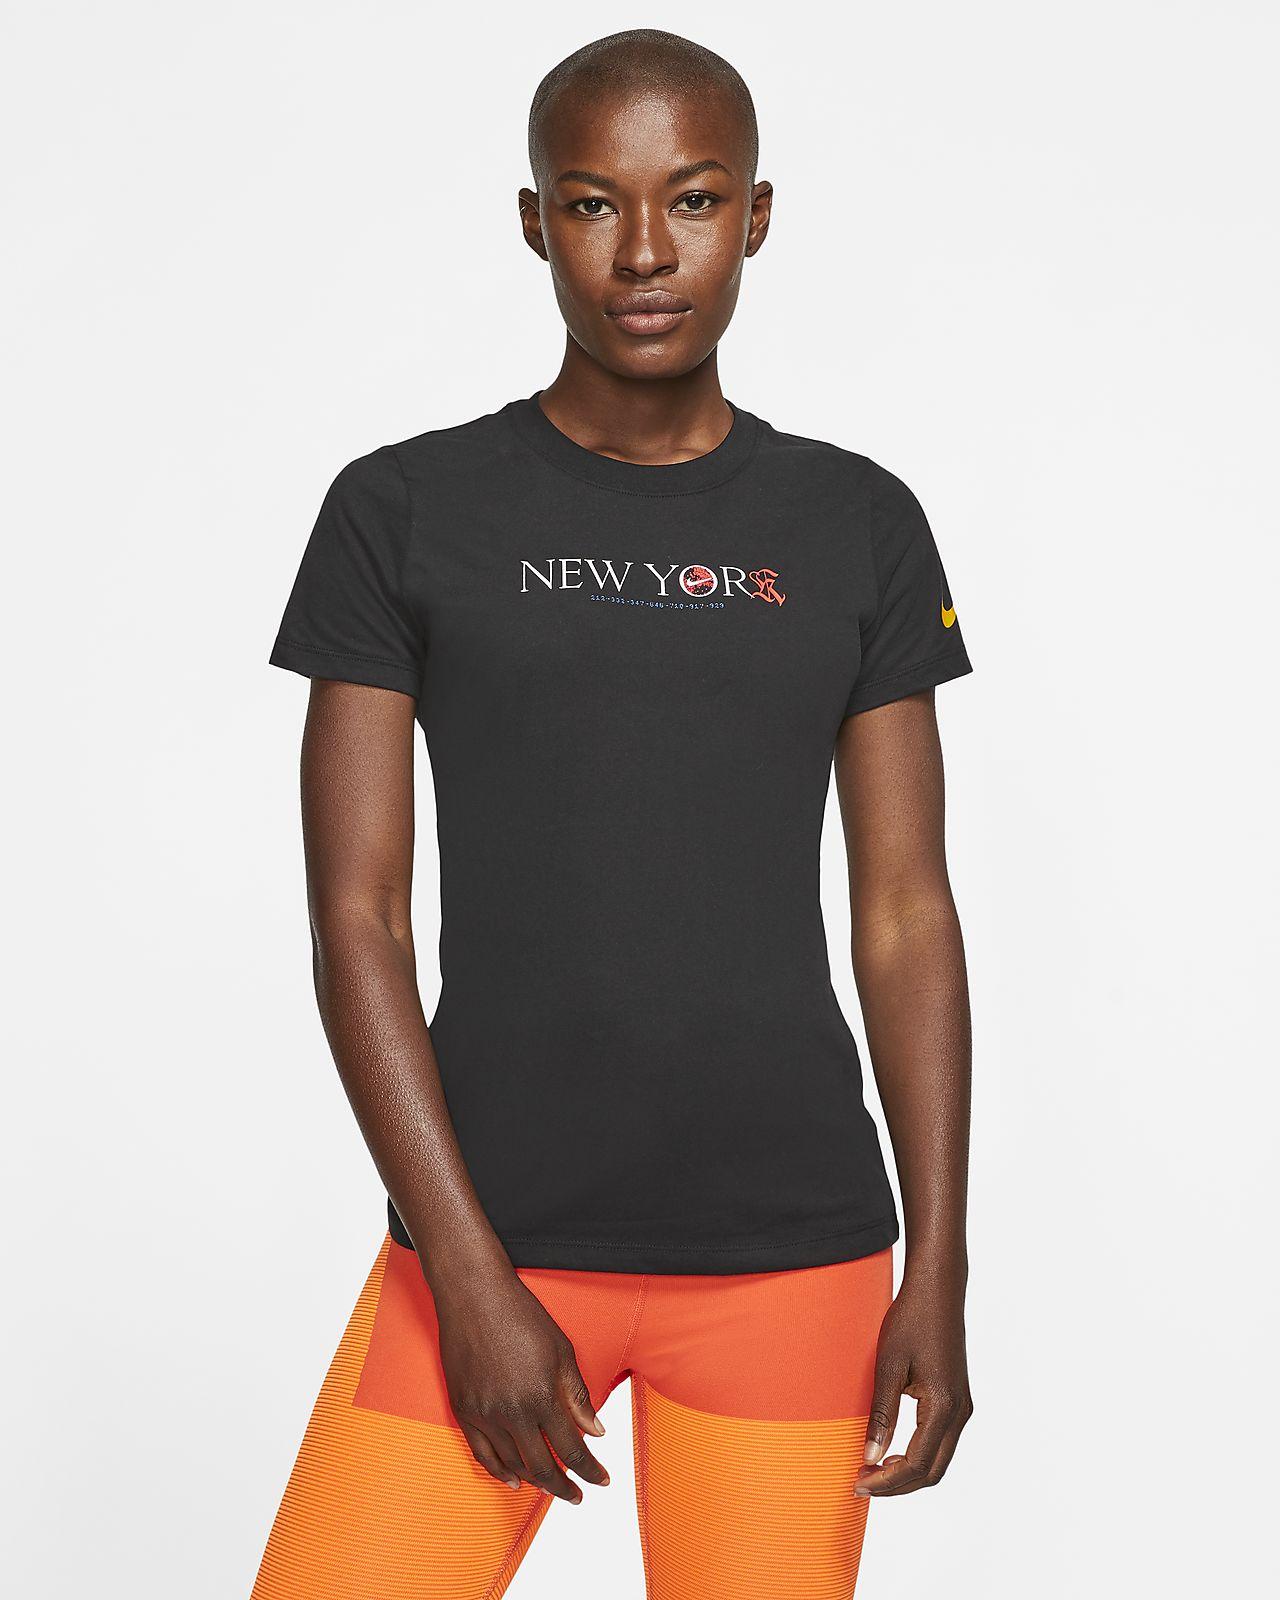 Nike Dri-FIT NYC Women's Running T-Shirt